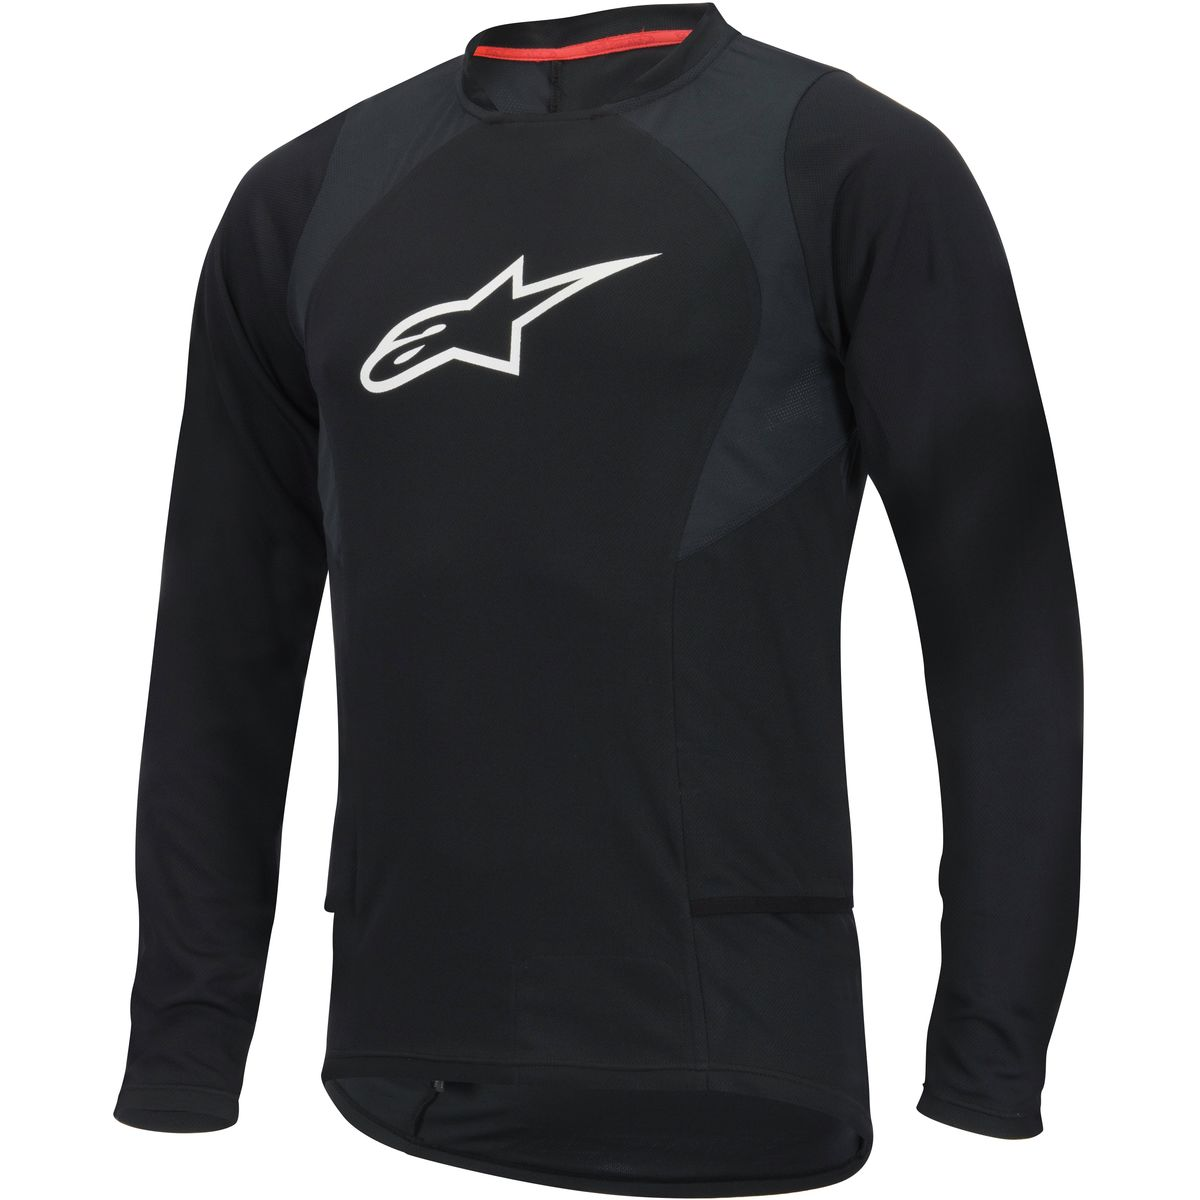 alpinestars long sleeve t shirt